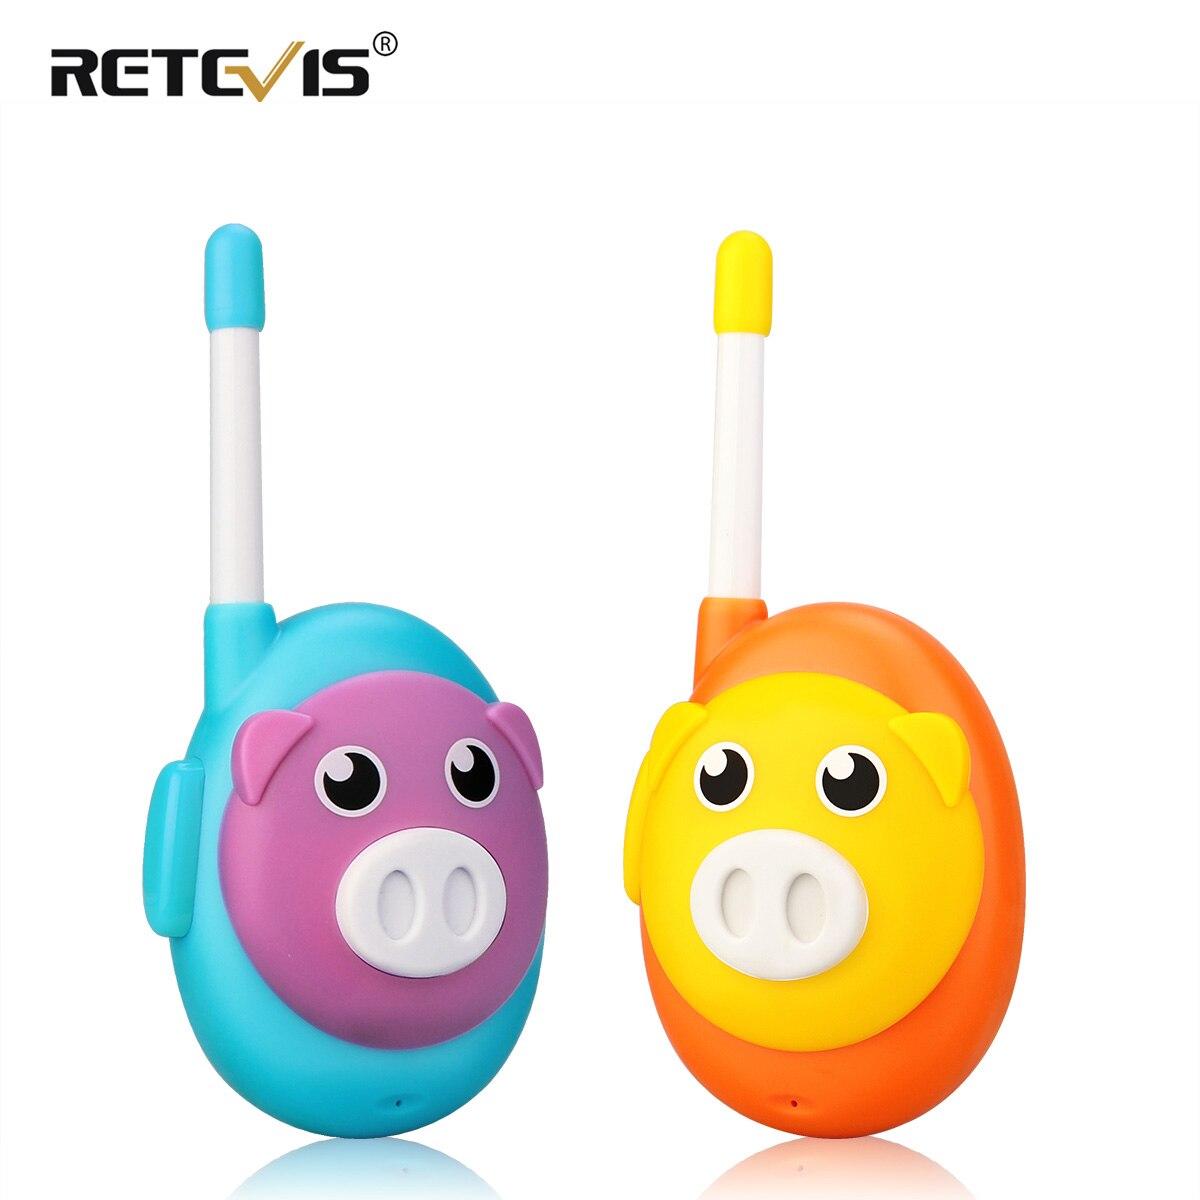 Retevis RB616 RB16 Walkie Talkie Children 2pcs Cute Pig Design1 Channel Two Color Walkie-talkies Birthday Gift Toy Walkie Talkie